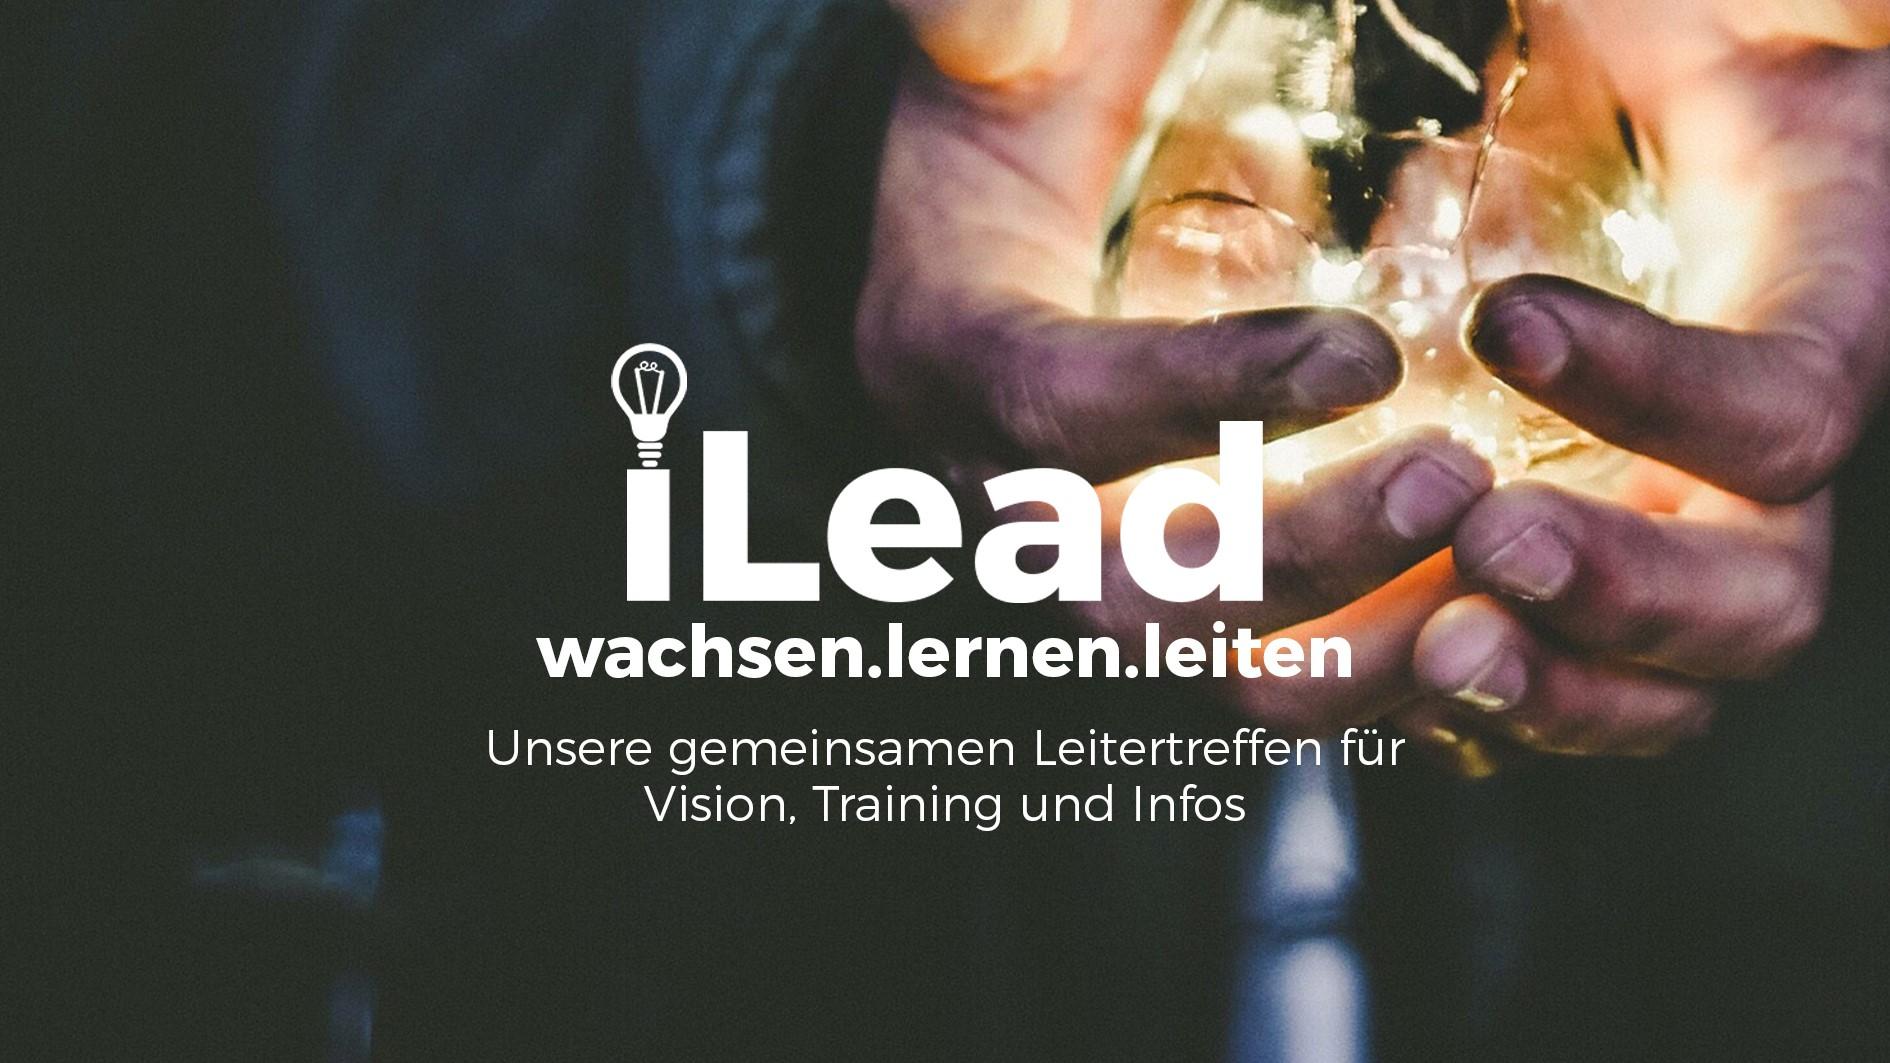 iLead.jpg